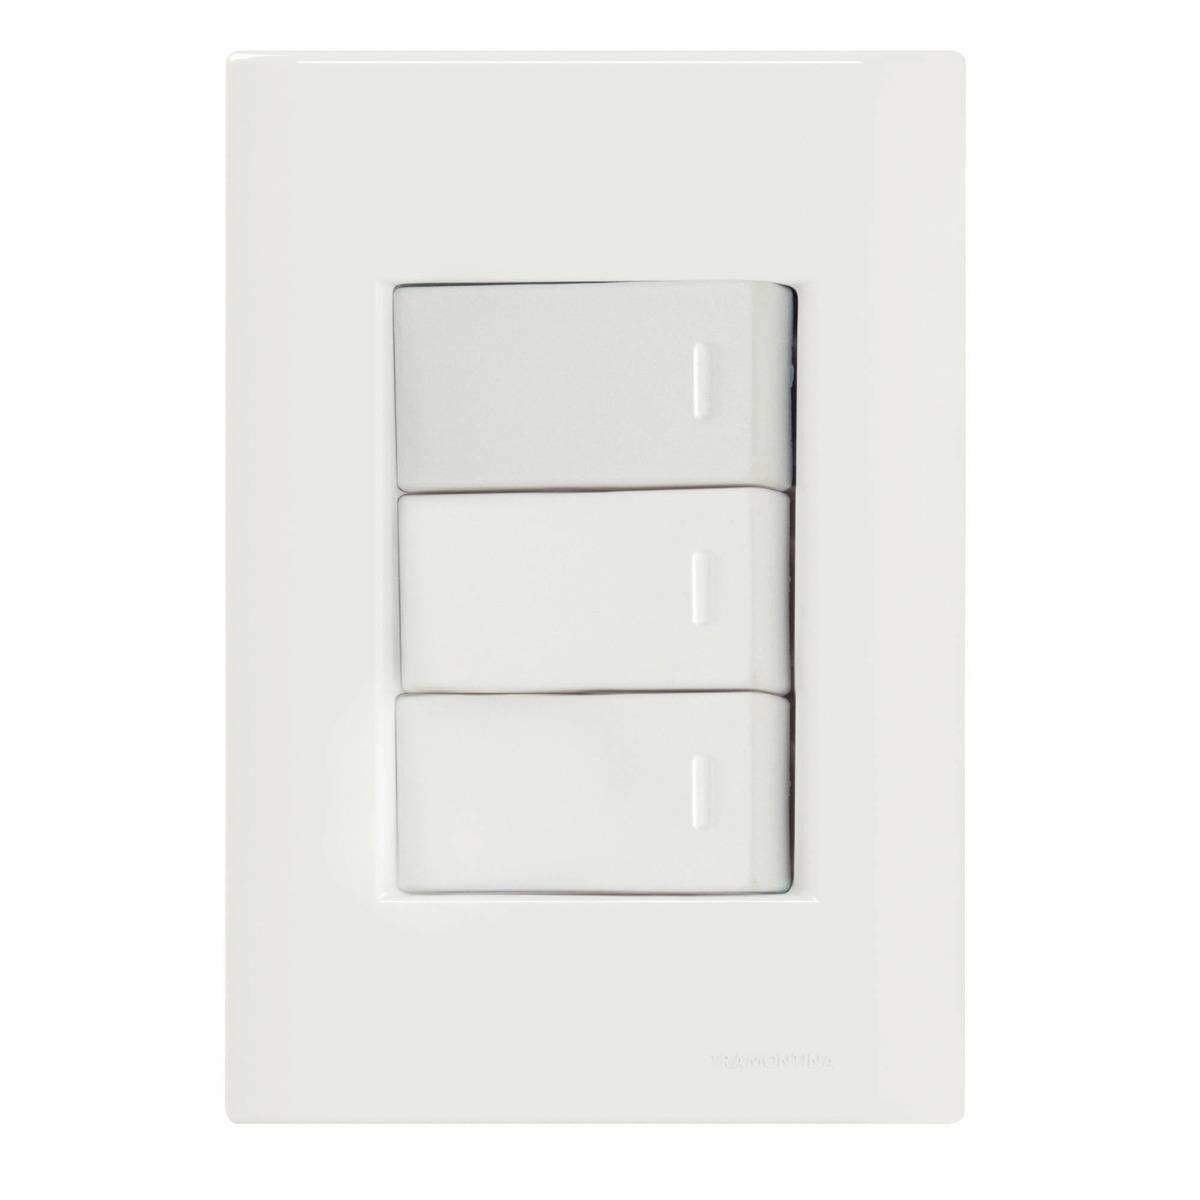 Conjunto Montado Liz 4x2 3 Interruptores Simples 10A 250V Tr - LCGELETRO